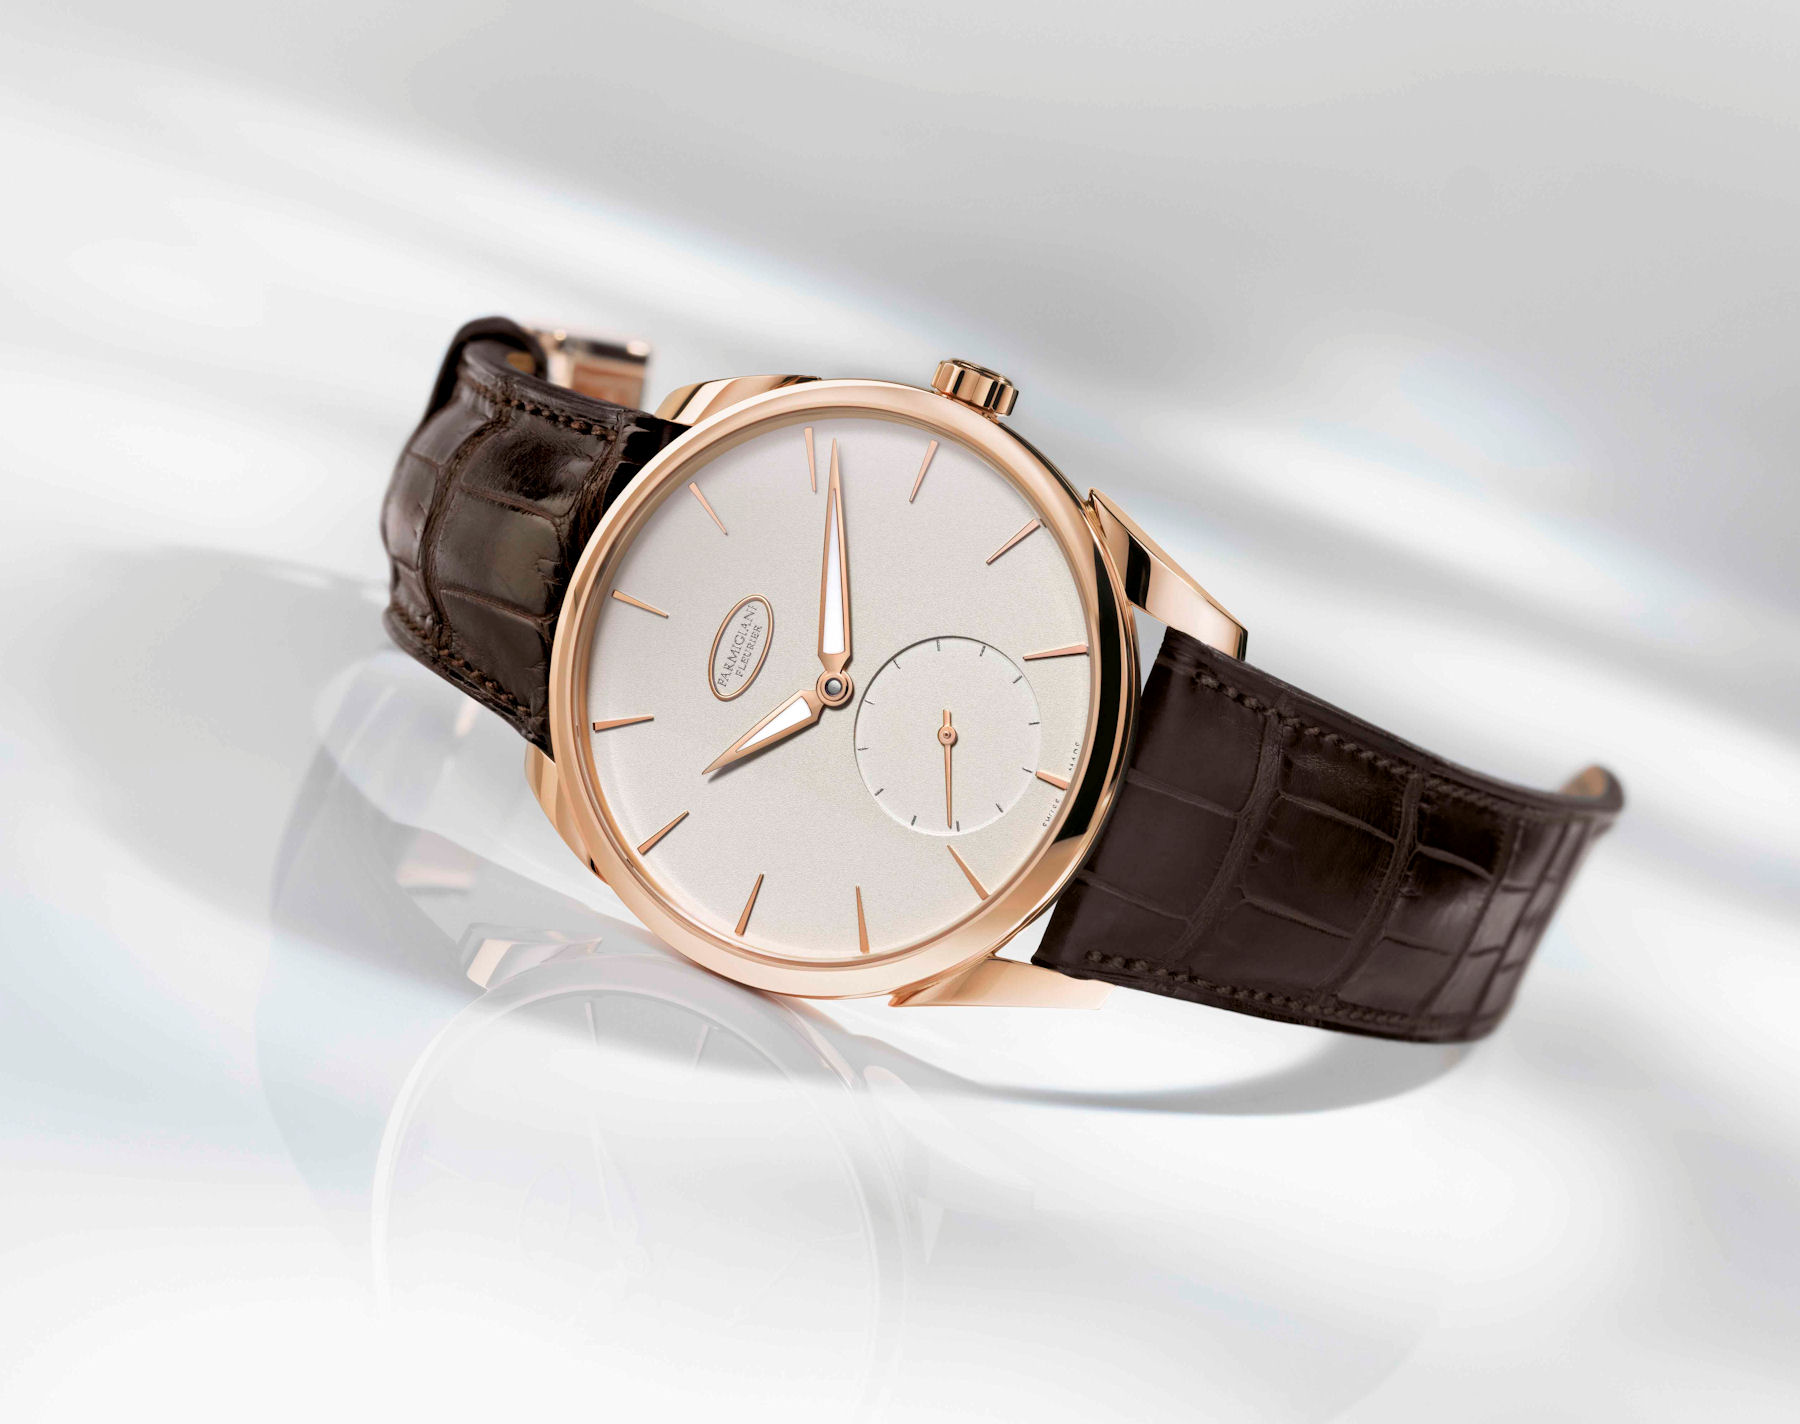 The supremely elegant Parmigiani Fleurier's Tonda 1950 timepiece